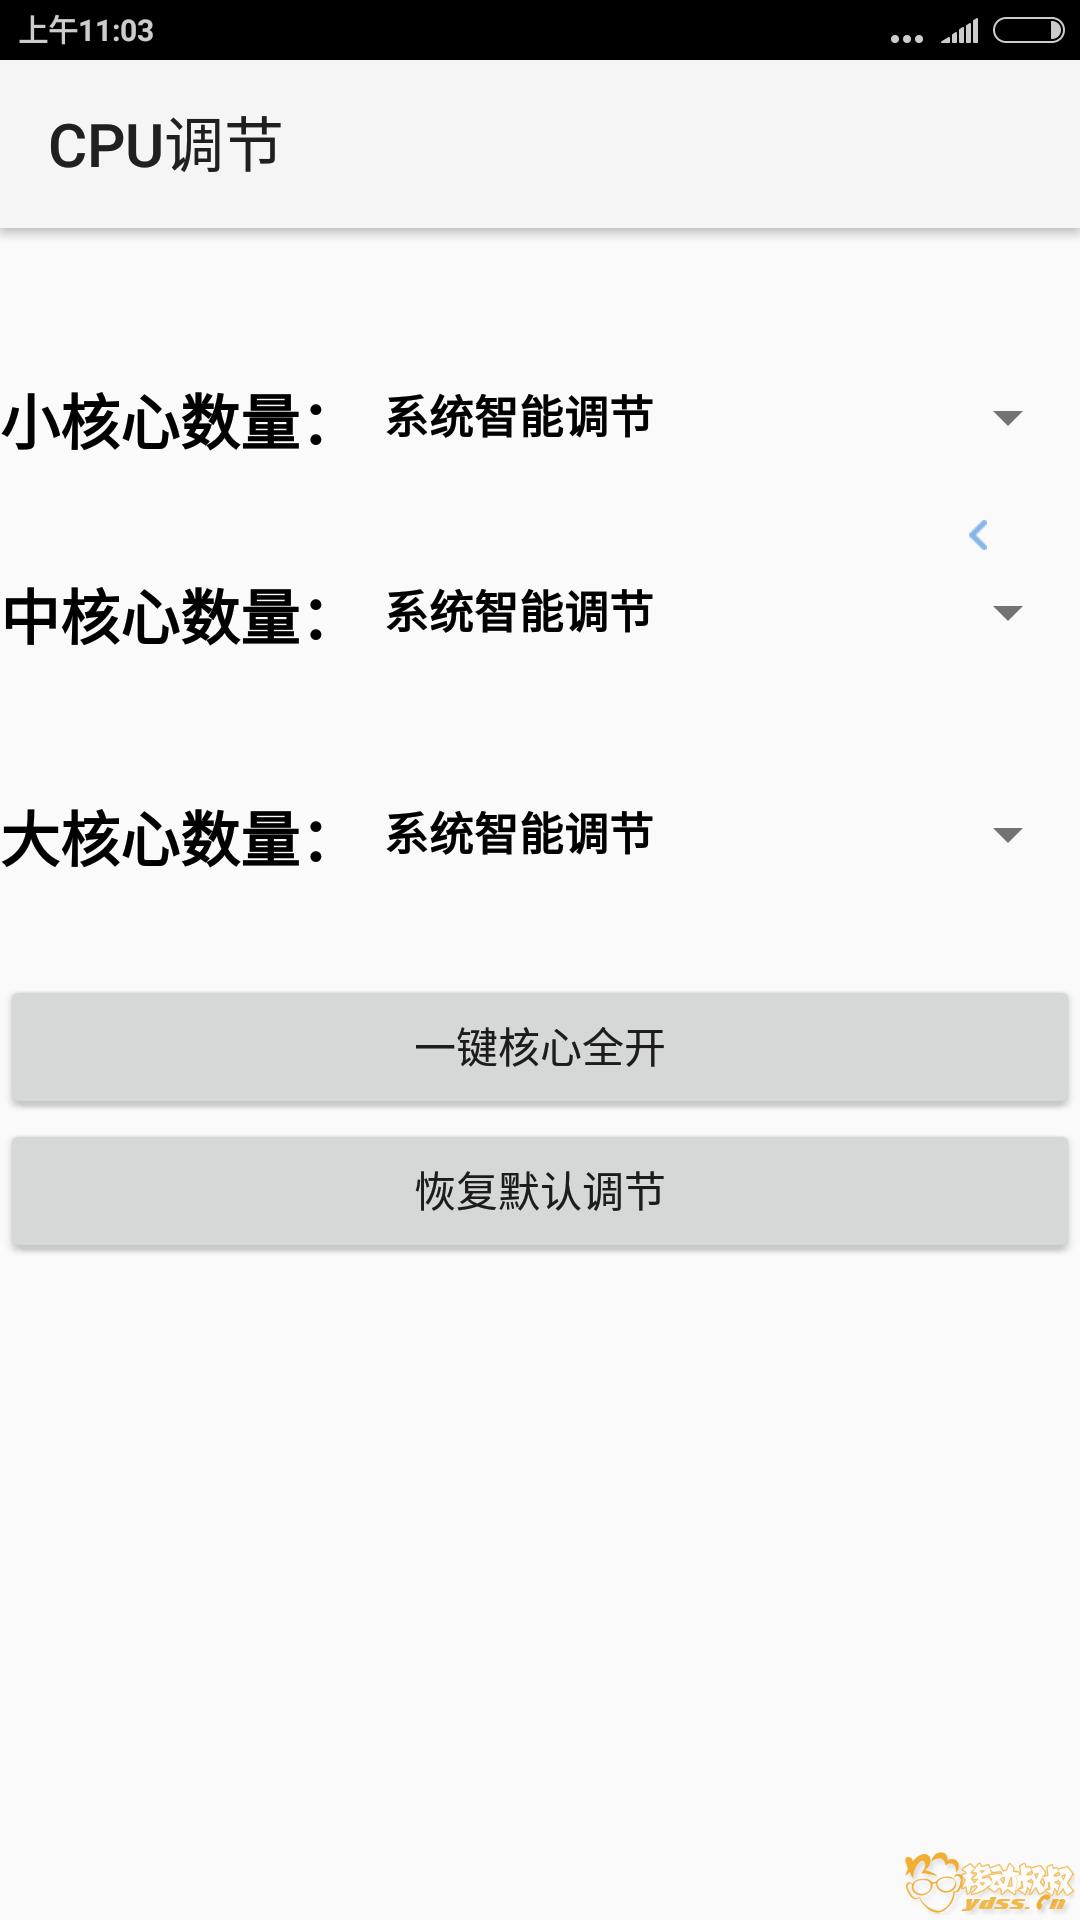 Screenshot_2018-01-28-11-03-06-889_com.eui.xd.png